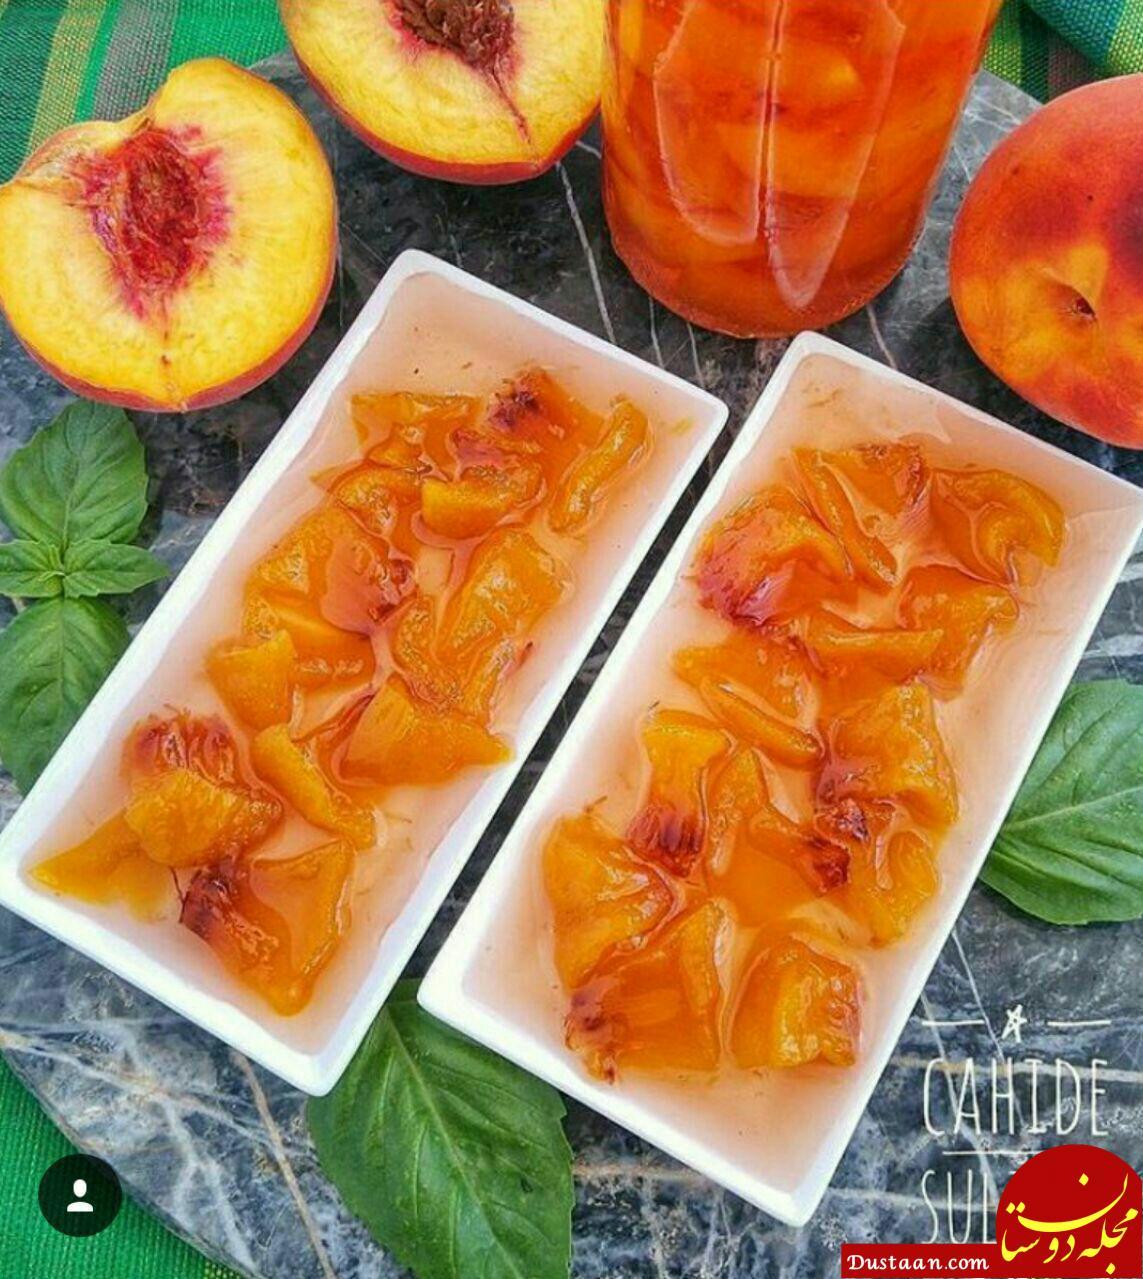 www.dustaan.com طرز تهیه مربای هلو به روشی خوشمزه!